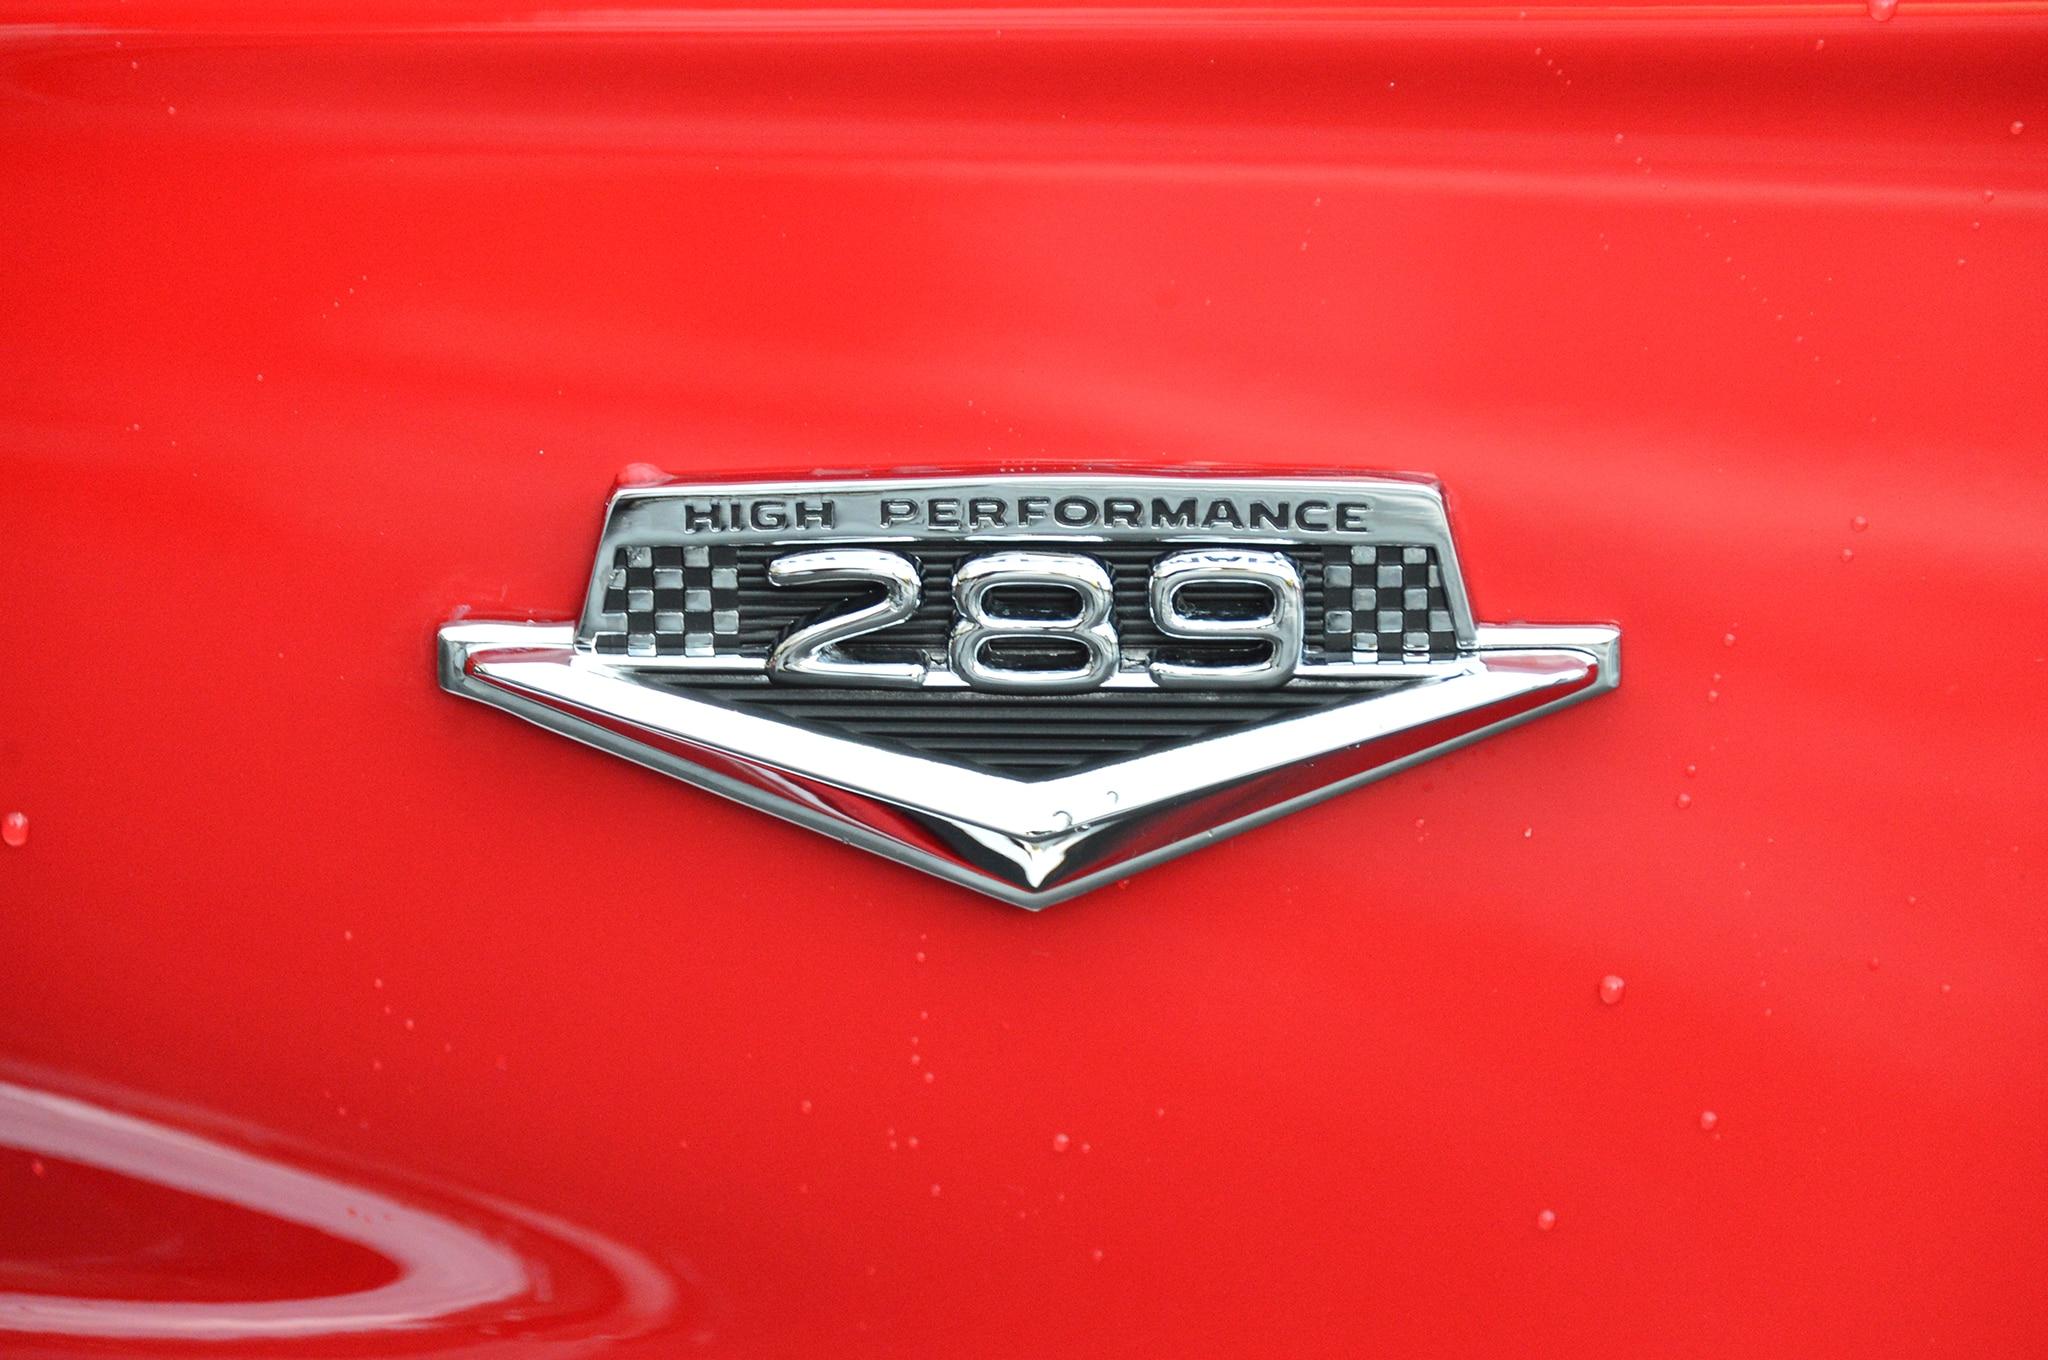 1966 Mustang Gt 350 Engine